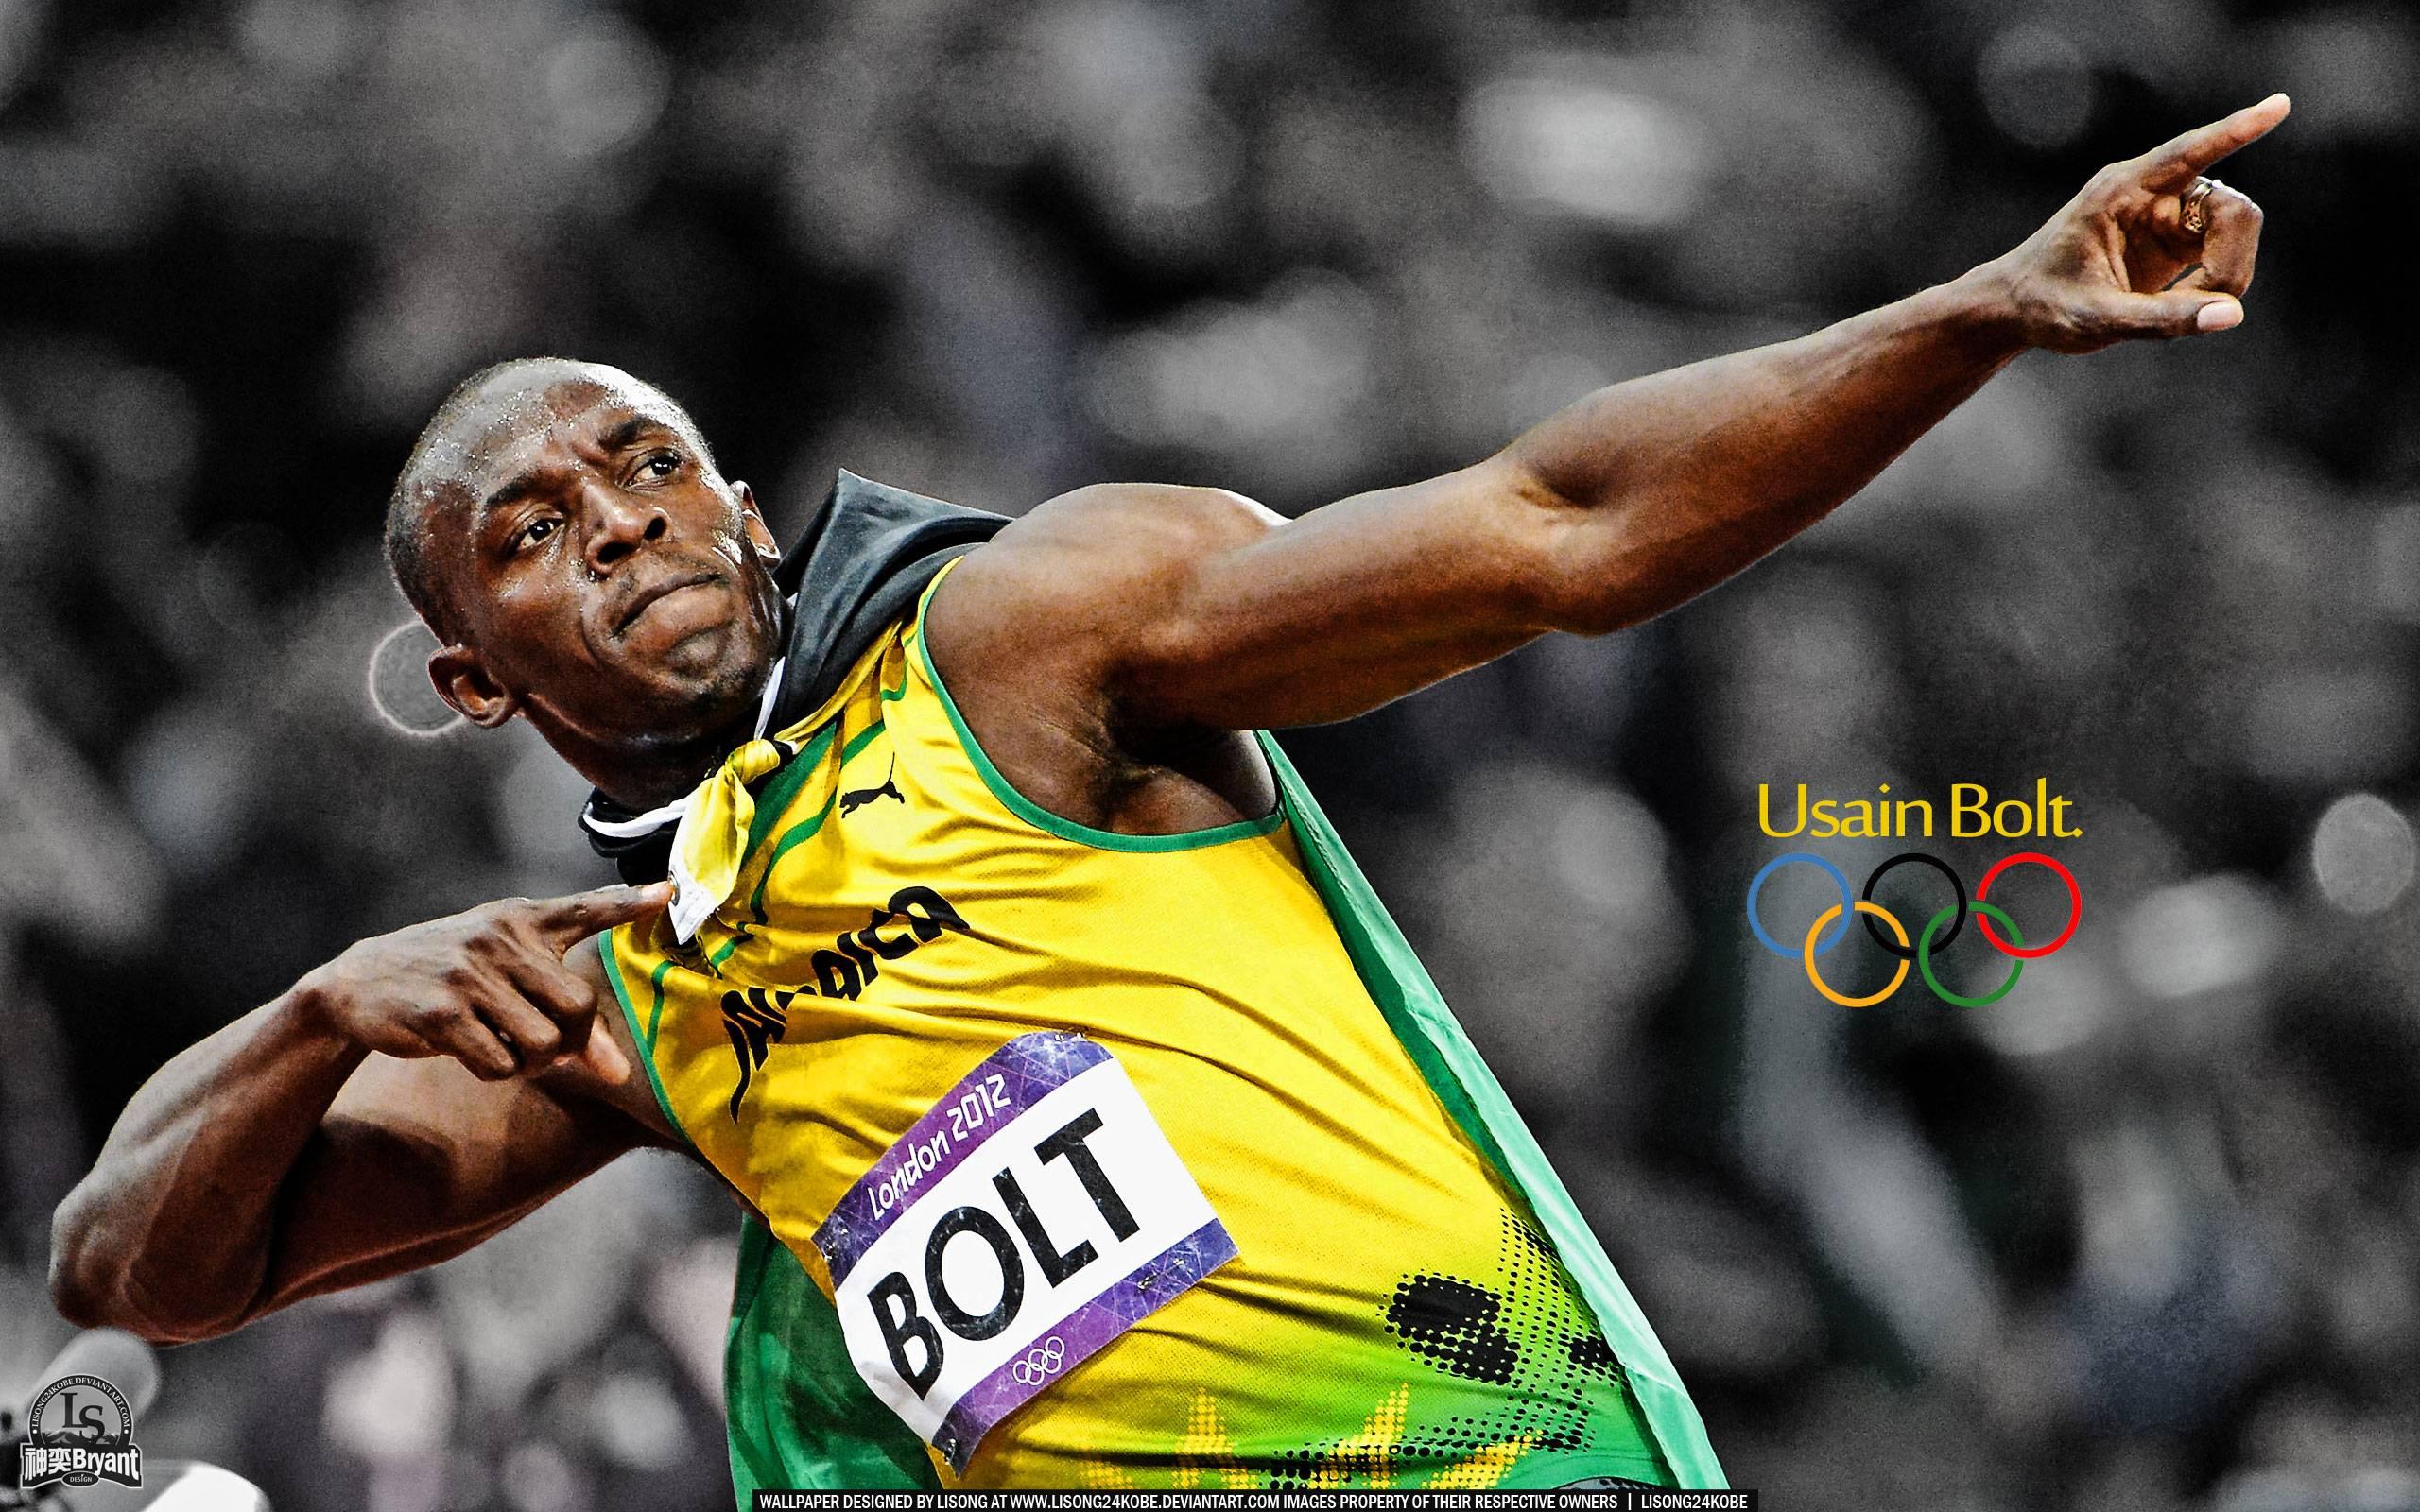 Free Wallpapers - Usain Bolt 2012 Celebrating 2560x1600 wallpaper